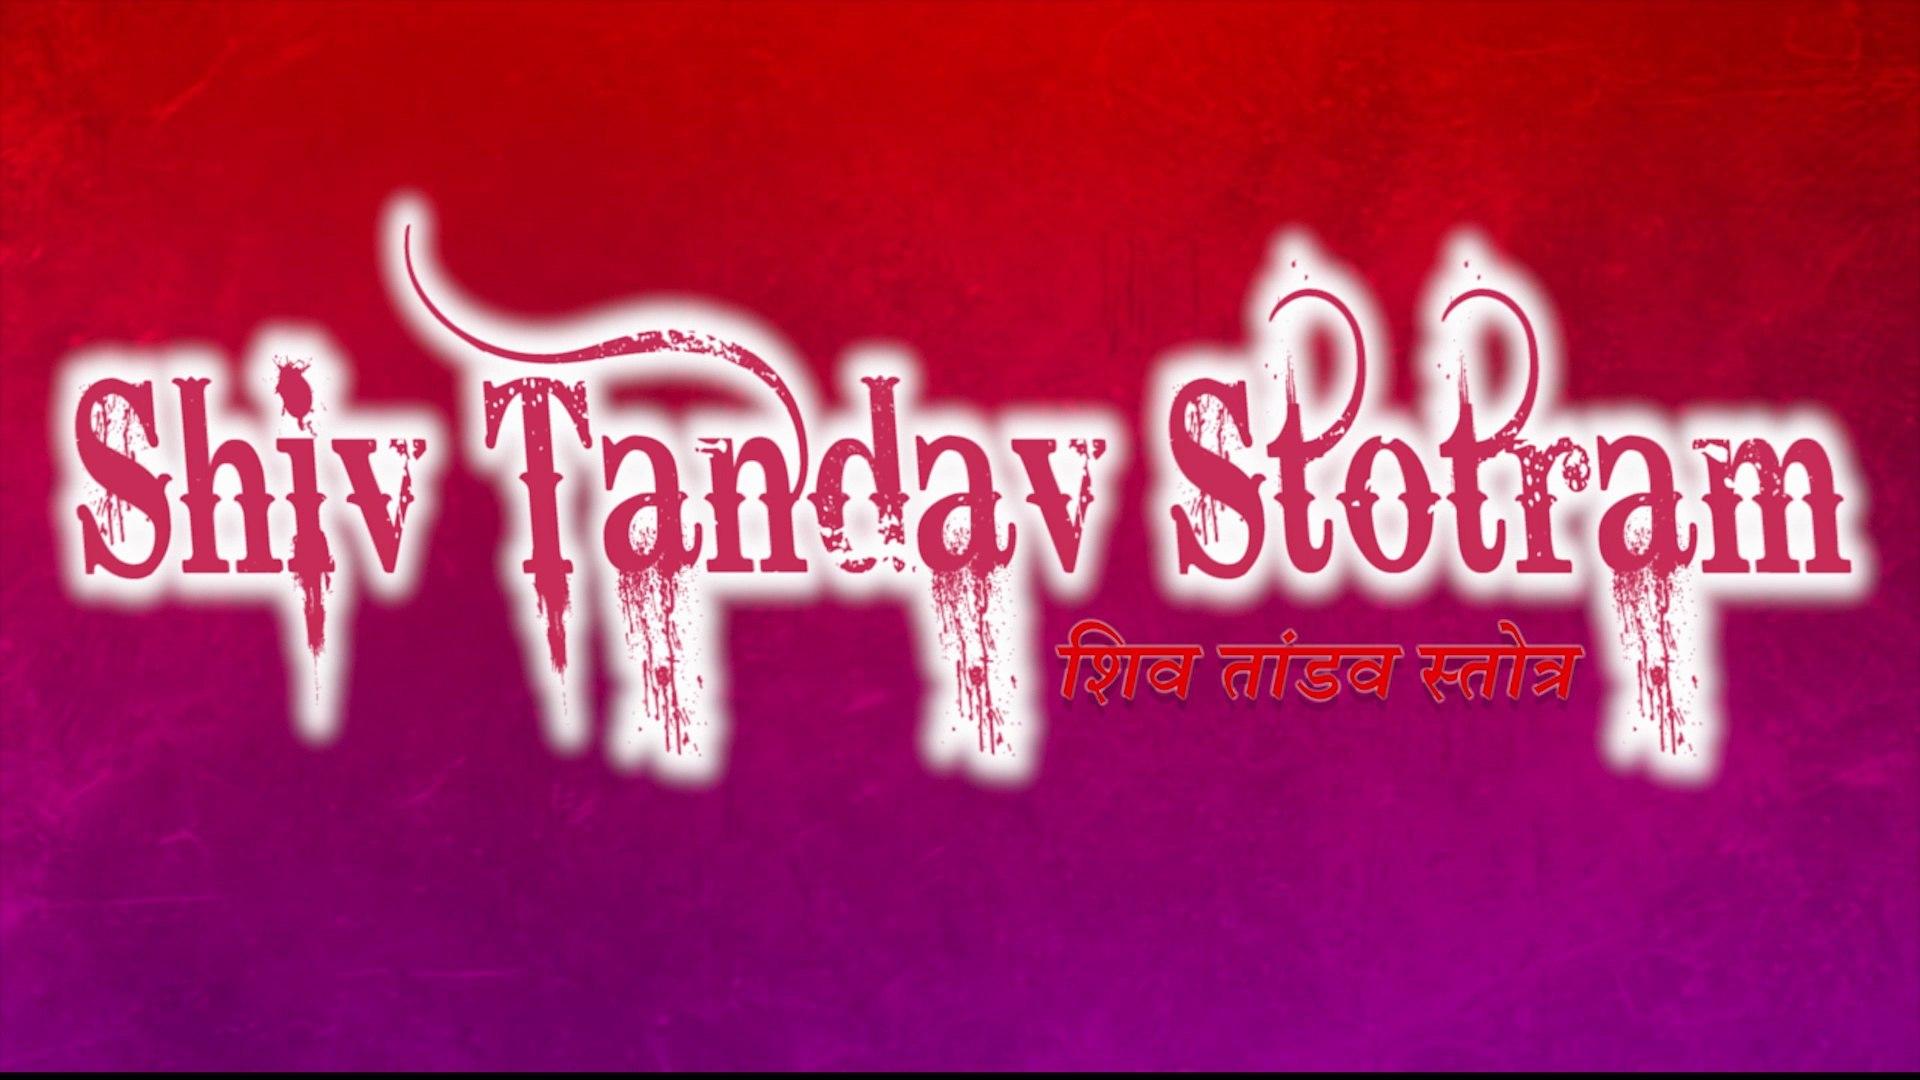 SHIV TANDAV STOTRAM | शिवतांडव स्तोत्रम अर्ध सहित हिंदी Original powerful 2020